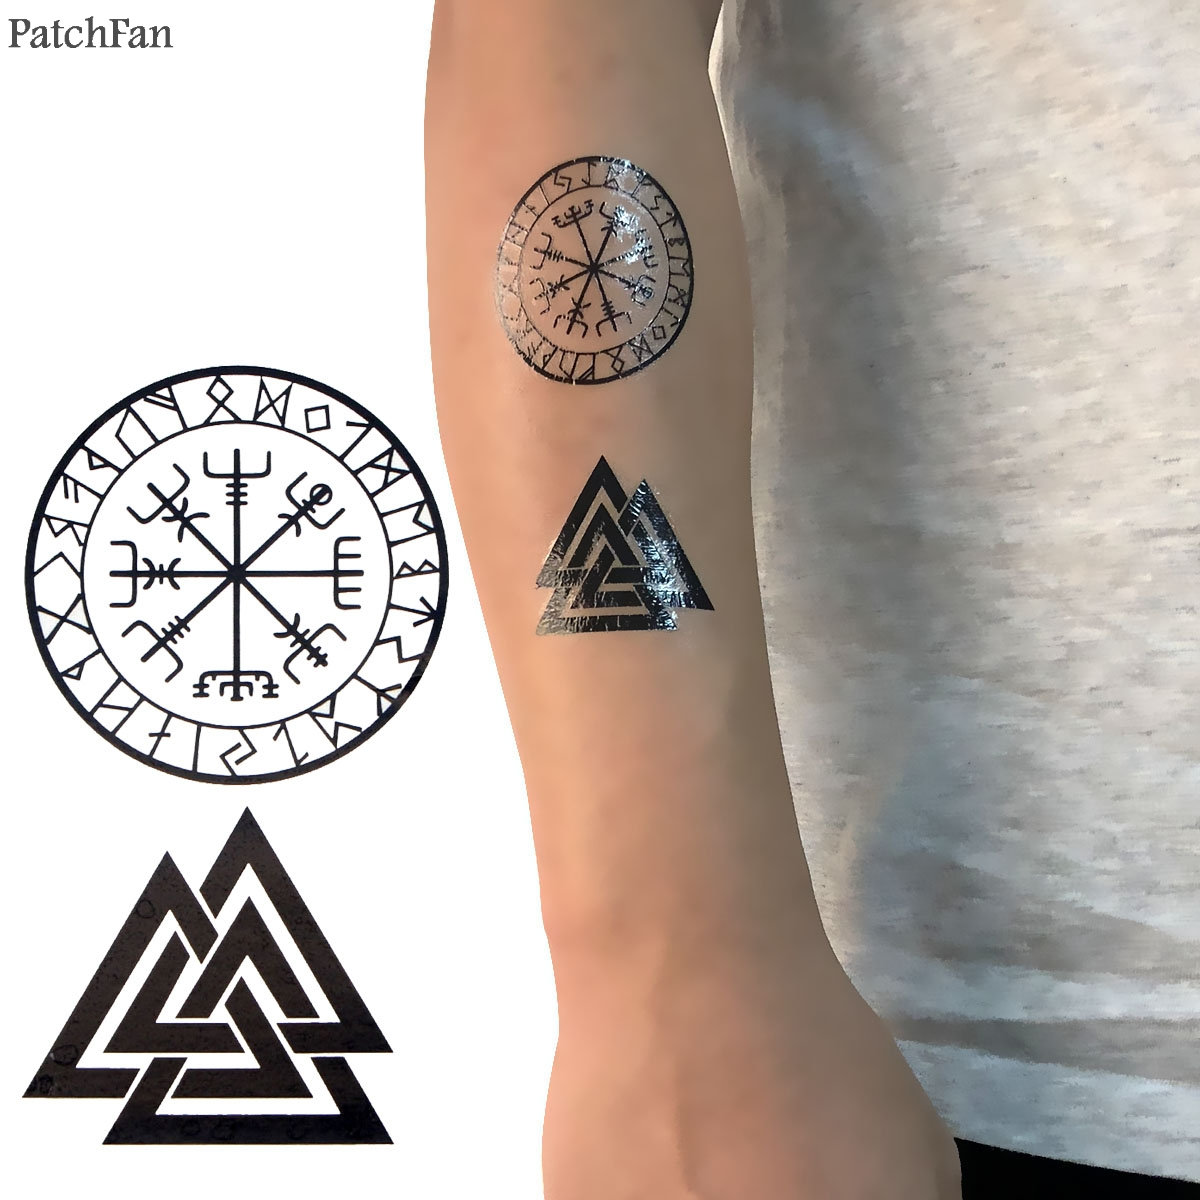 2pcs/set Patchfan Viking Cool Temporary Body Art Flash Tattoo Sticker Para Shoulder Arm Water Transfer Diy Makeup Cosplay A1168